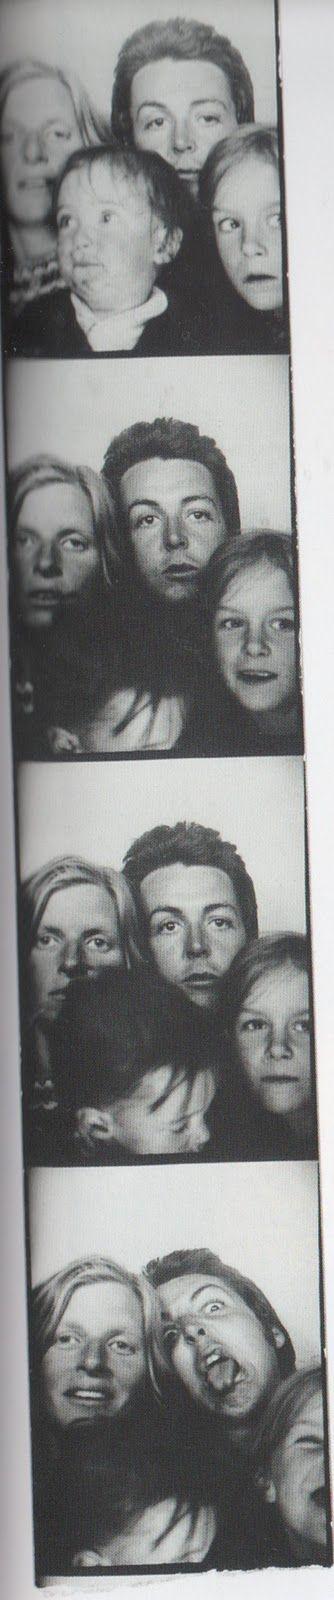 Paul McCartney, Linda Eastman-McCartney and their children (Funny Faces)